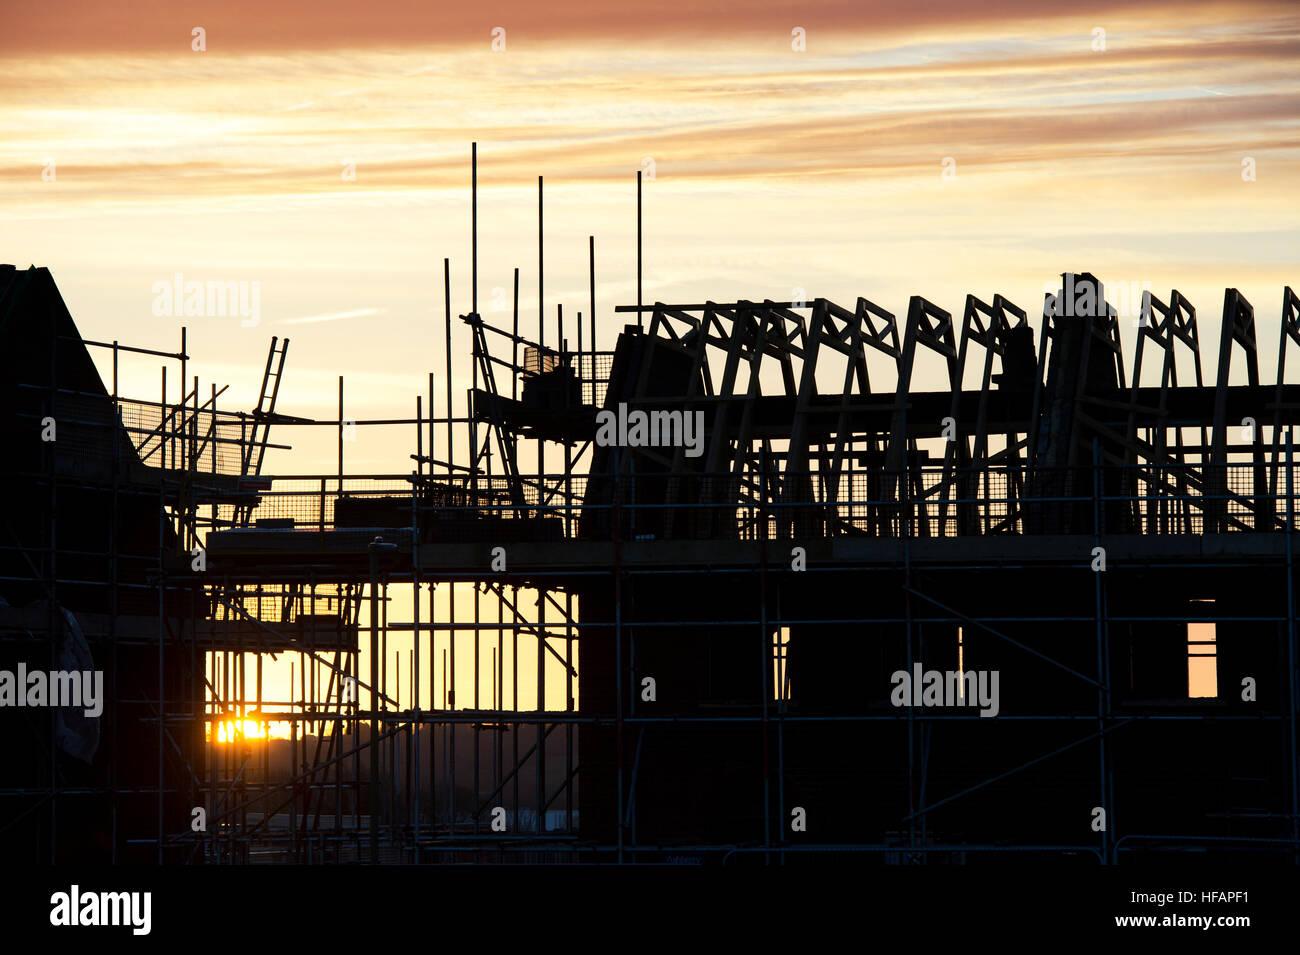 New housing development at sunrise. Silhouette. Banbury, Oxfordshire, England - Stock Image